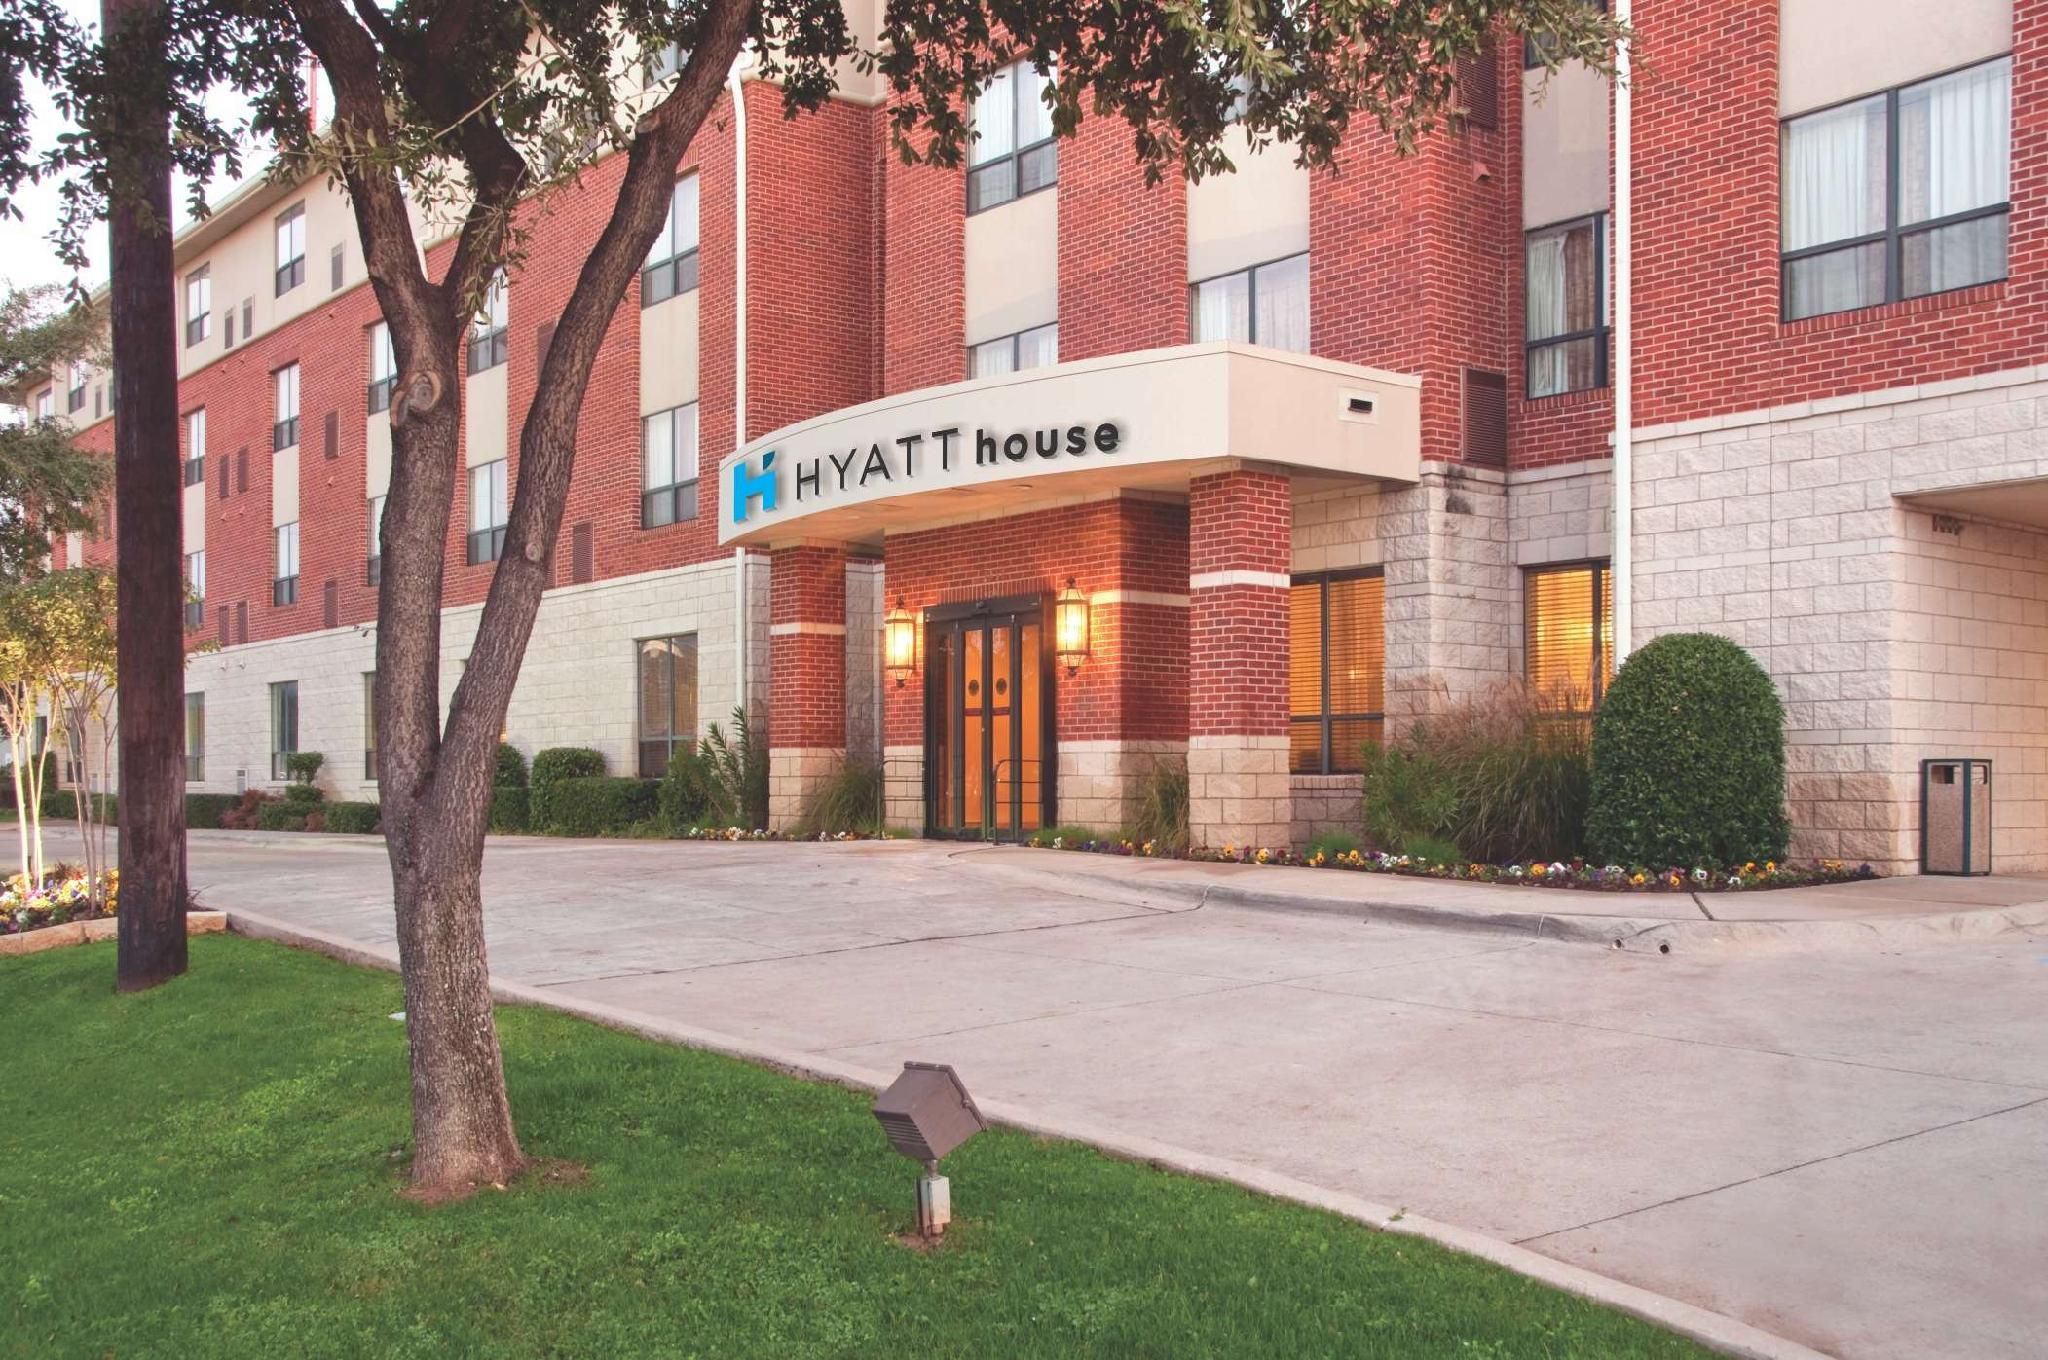 Hyatt House Dallas Uptown